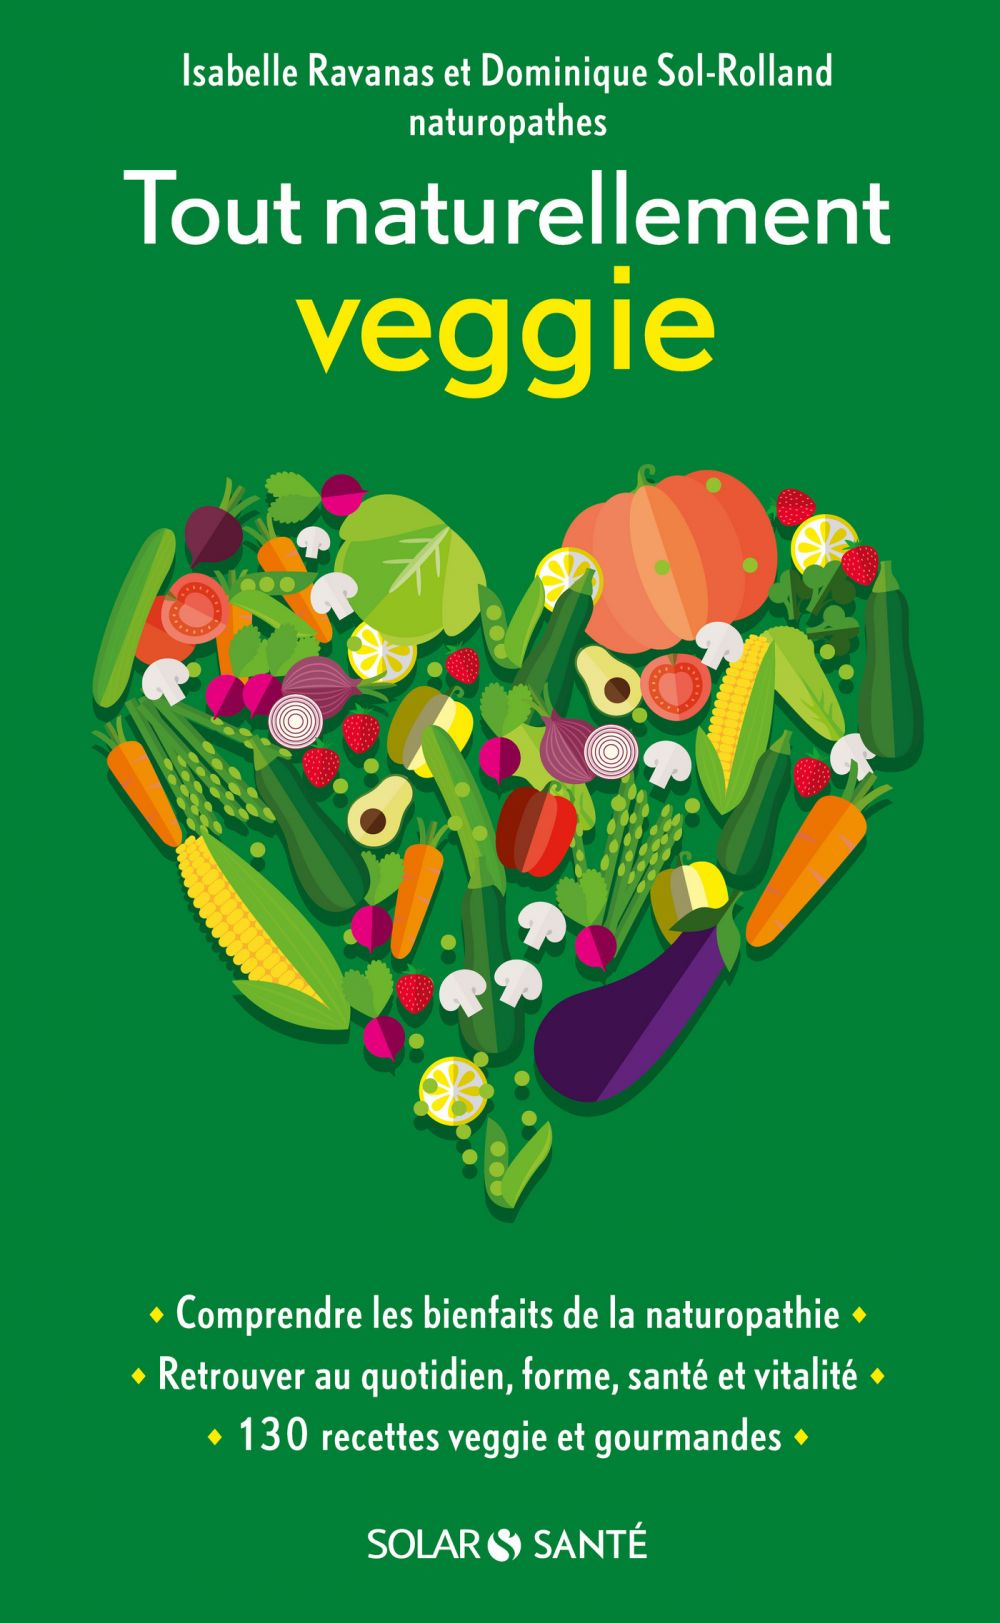 Tout naturellement veggie! |